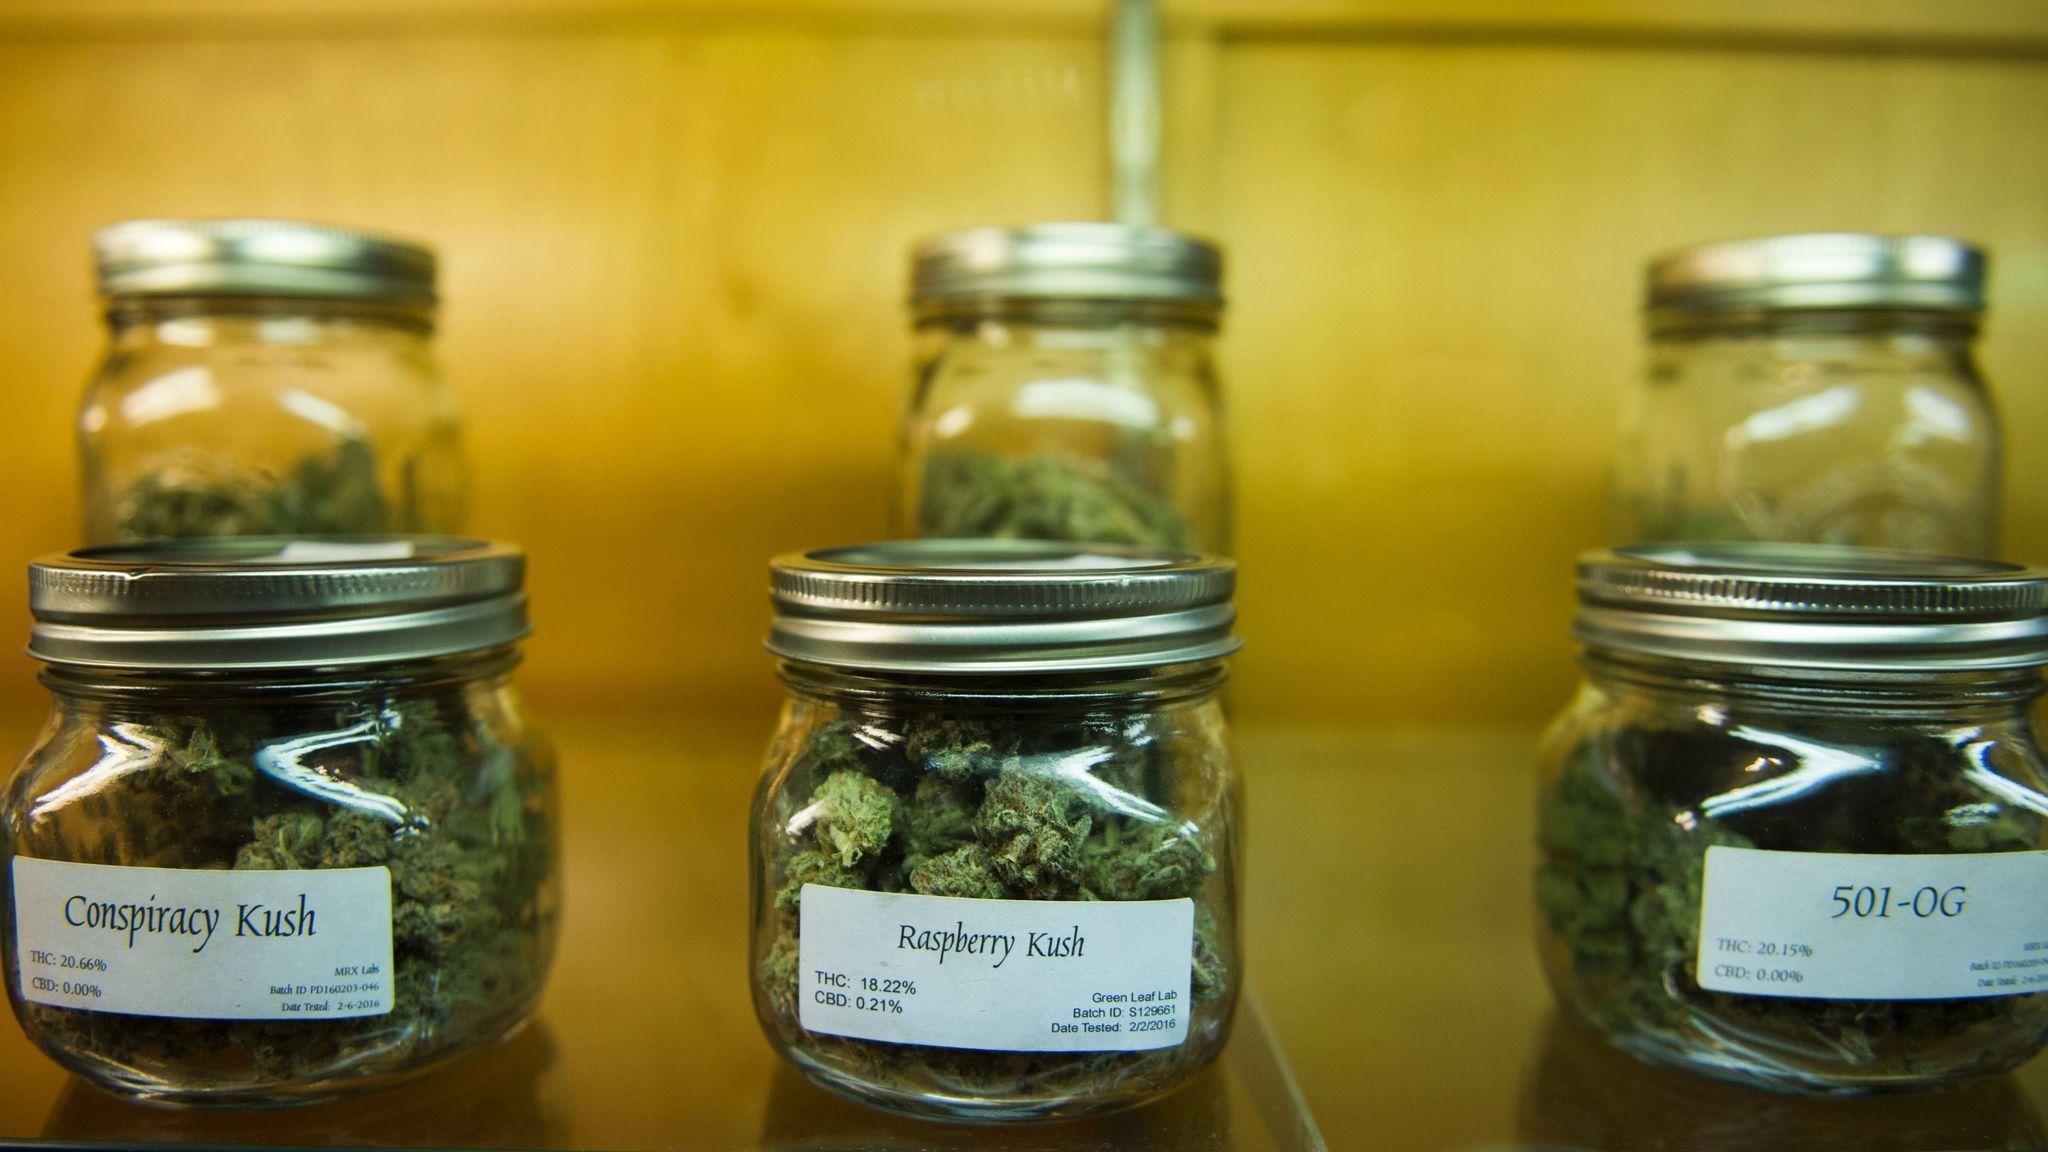 What is the future of recreational marijuana in Trump's America?